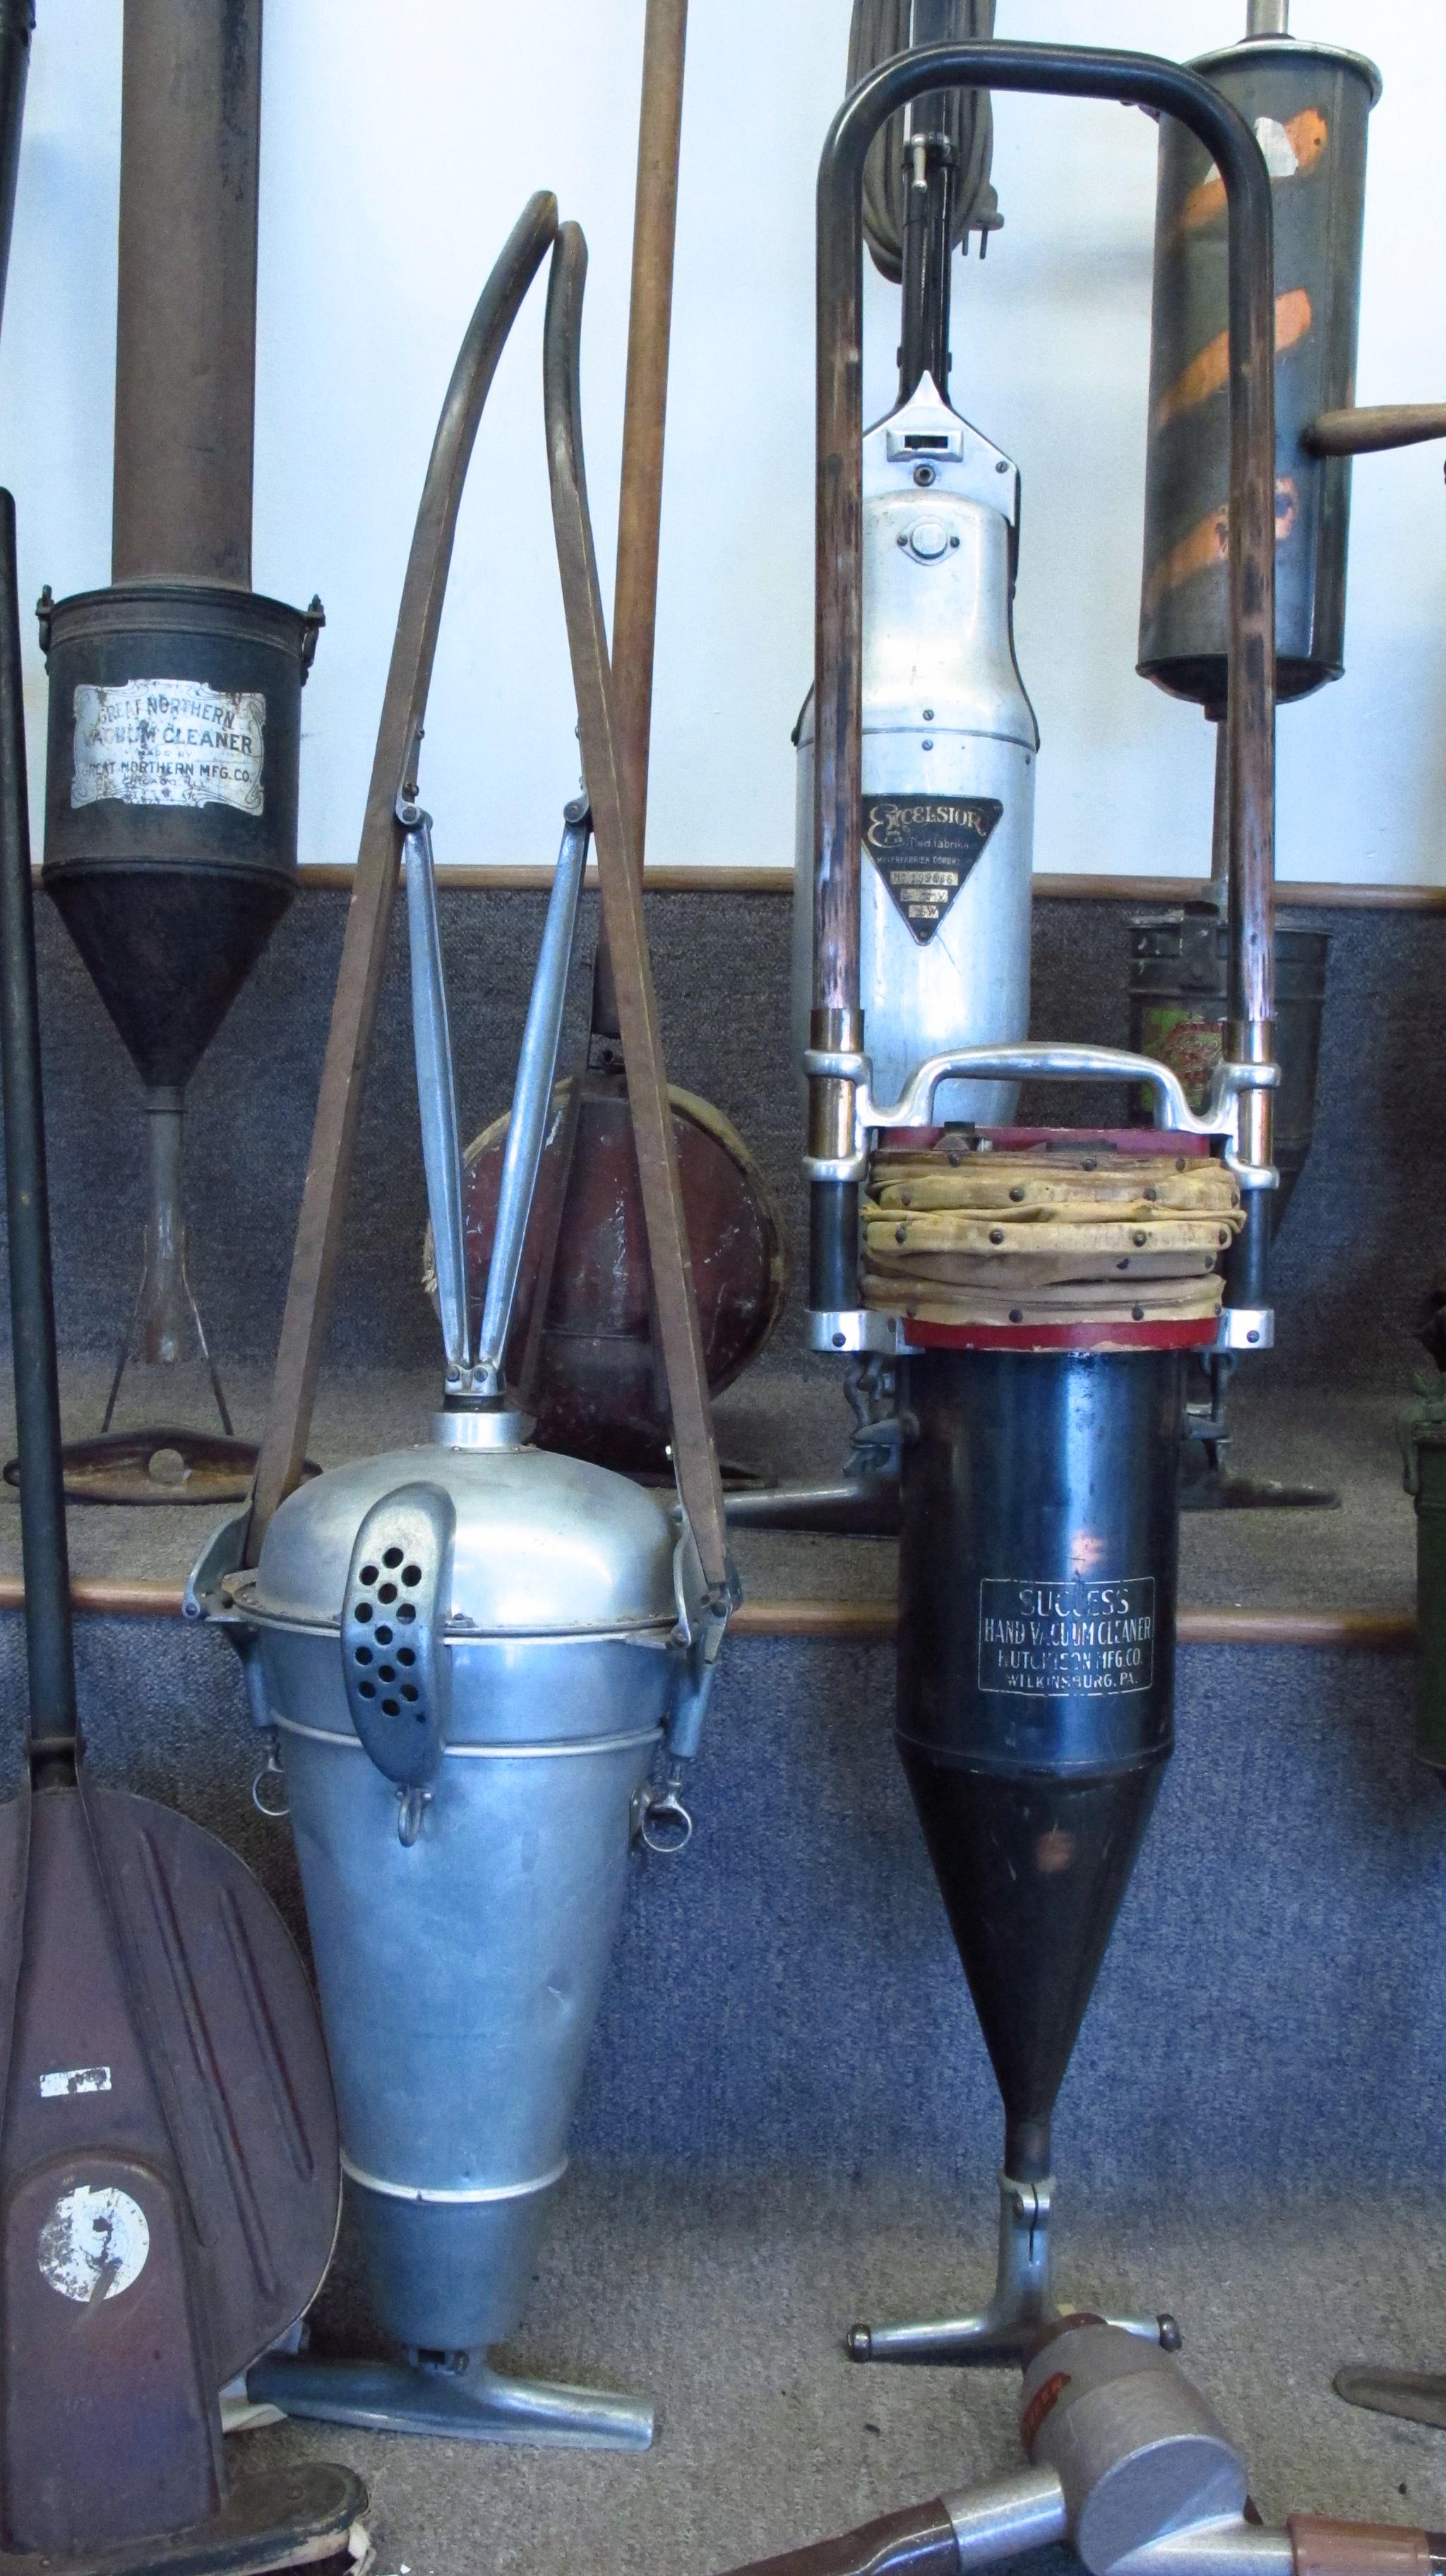 Time Saving Devices Starks Vacuum Museum